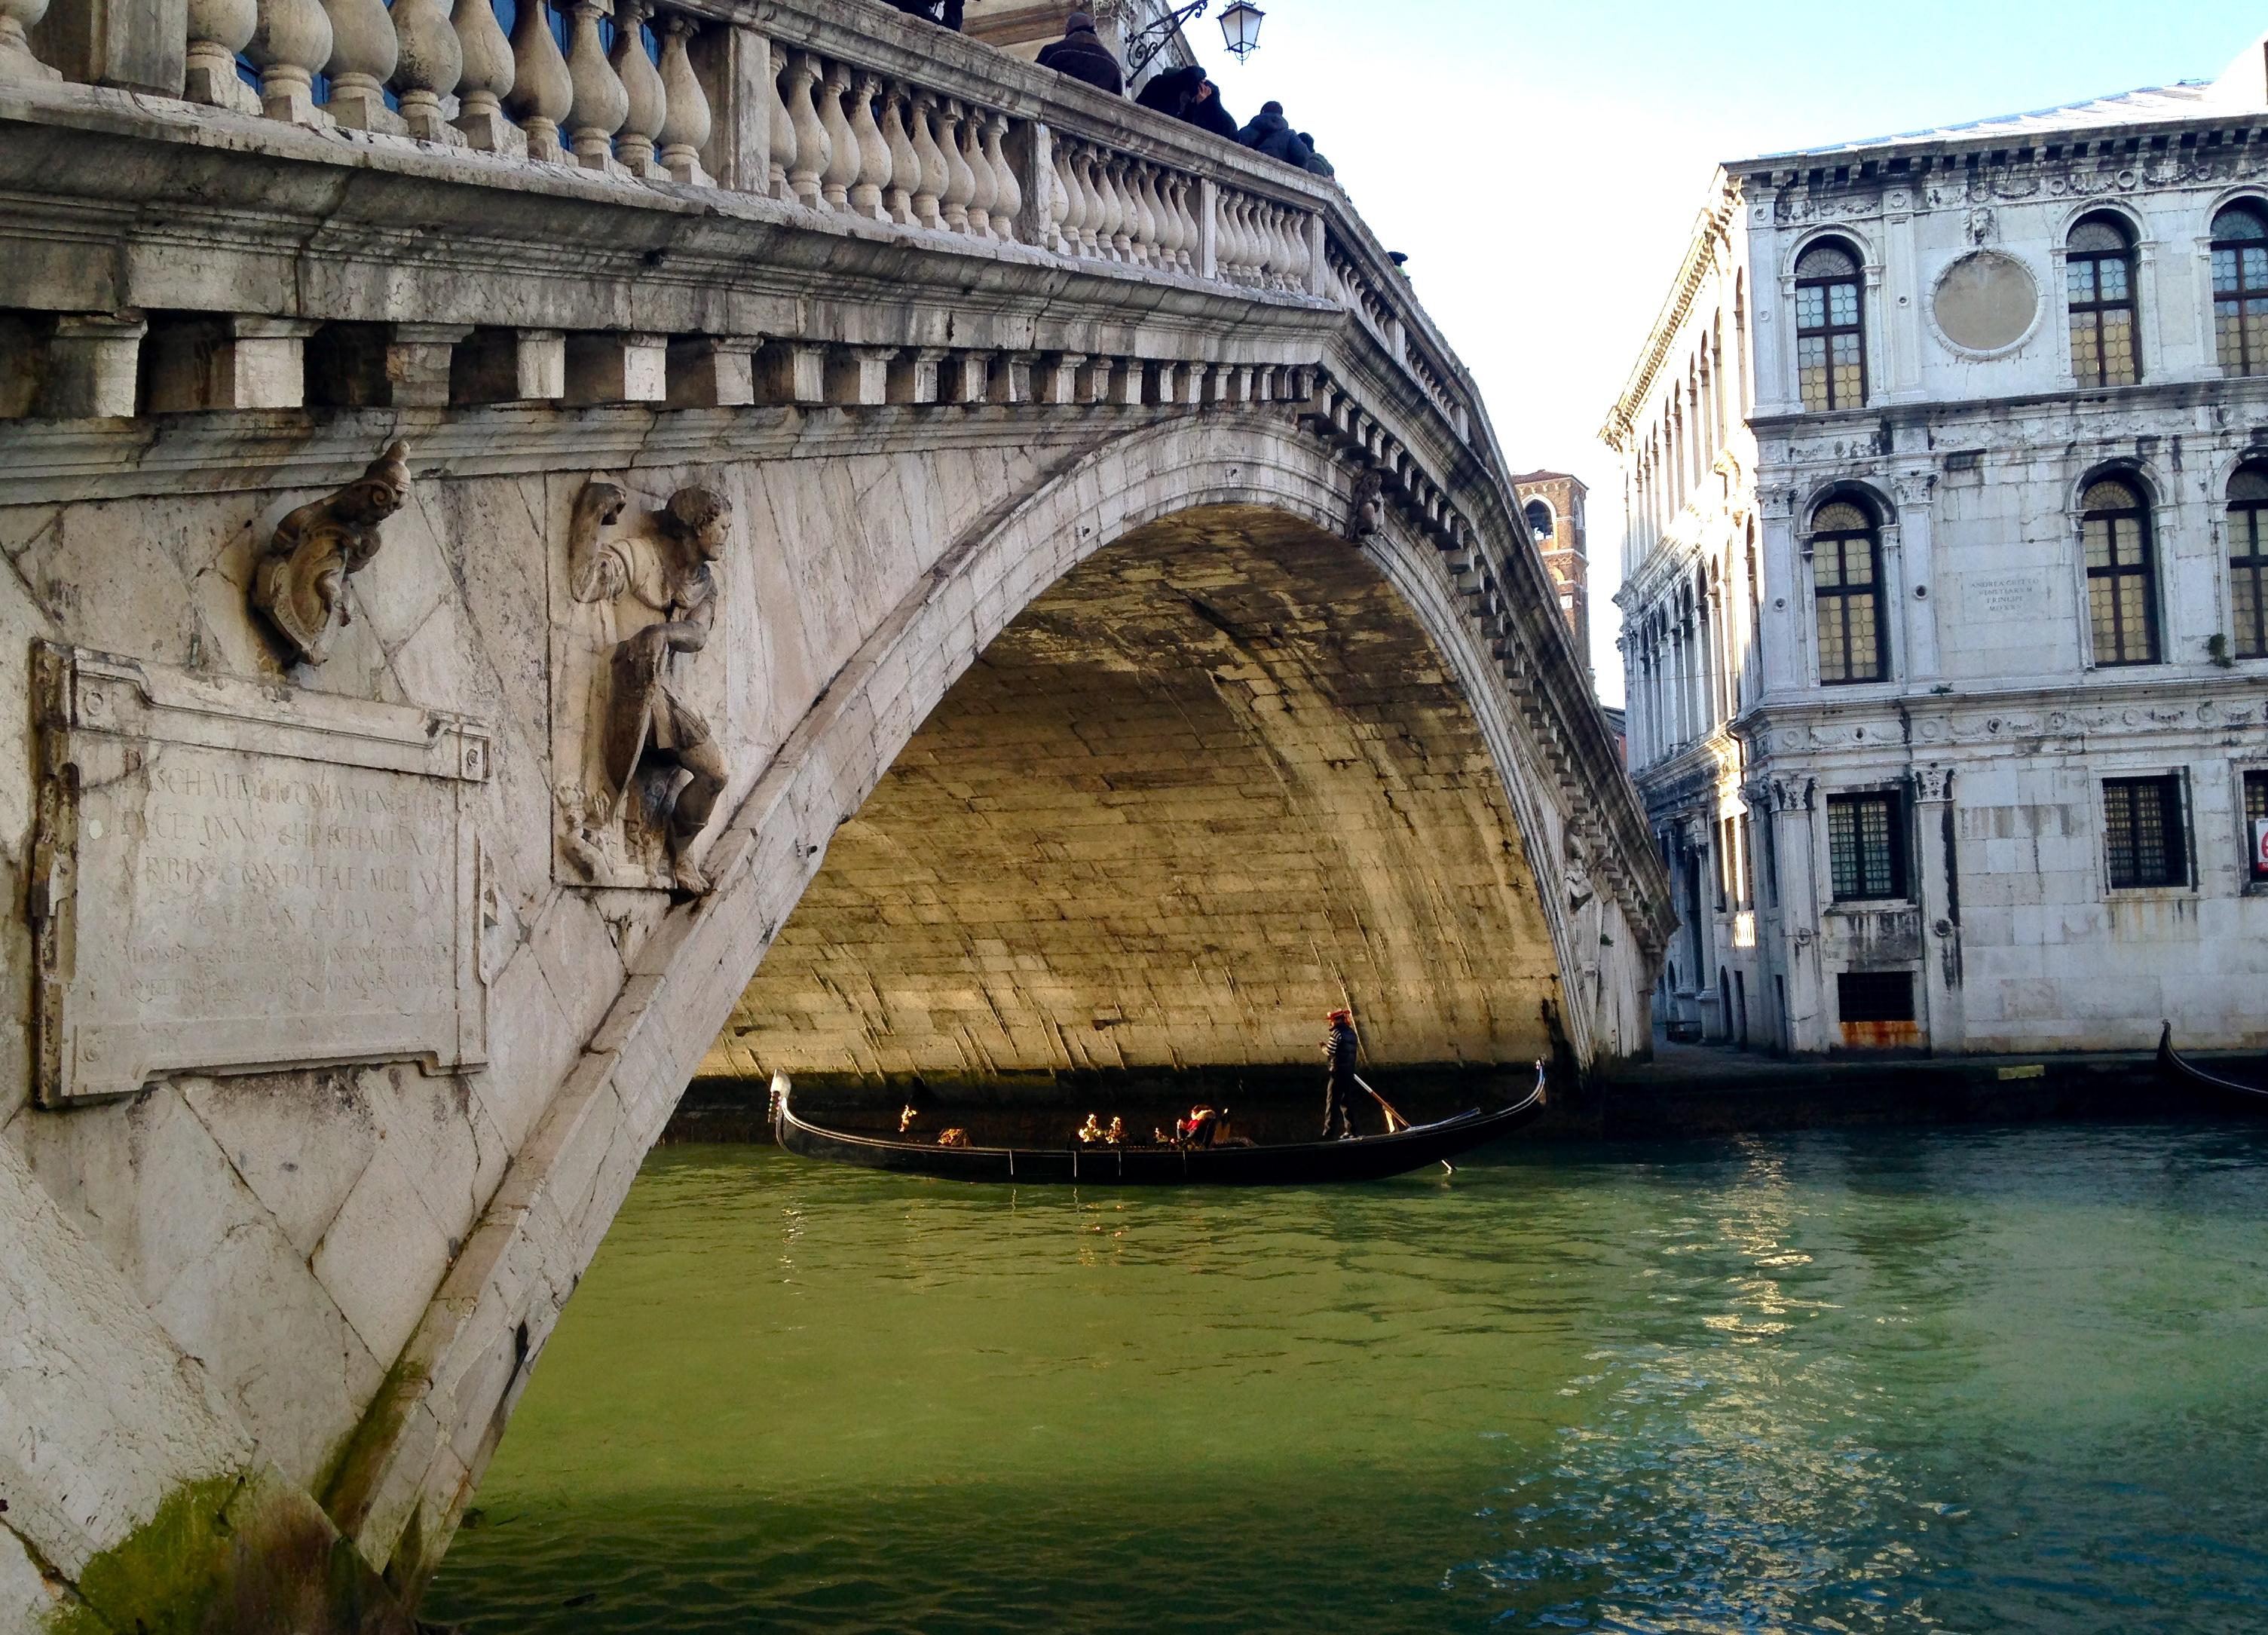 Bridge & Gondola, Venice, Italy